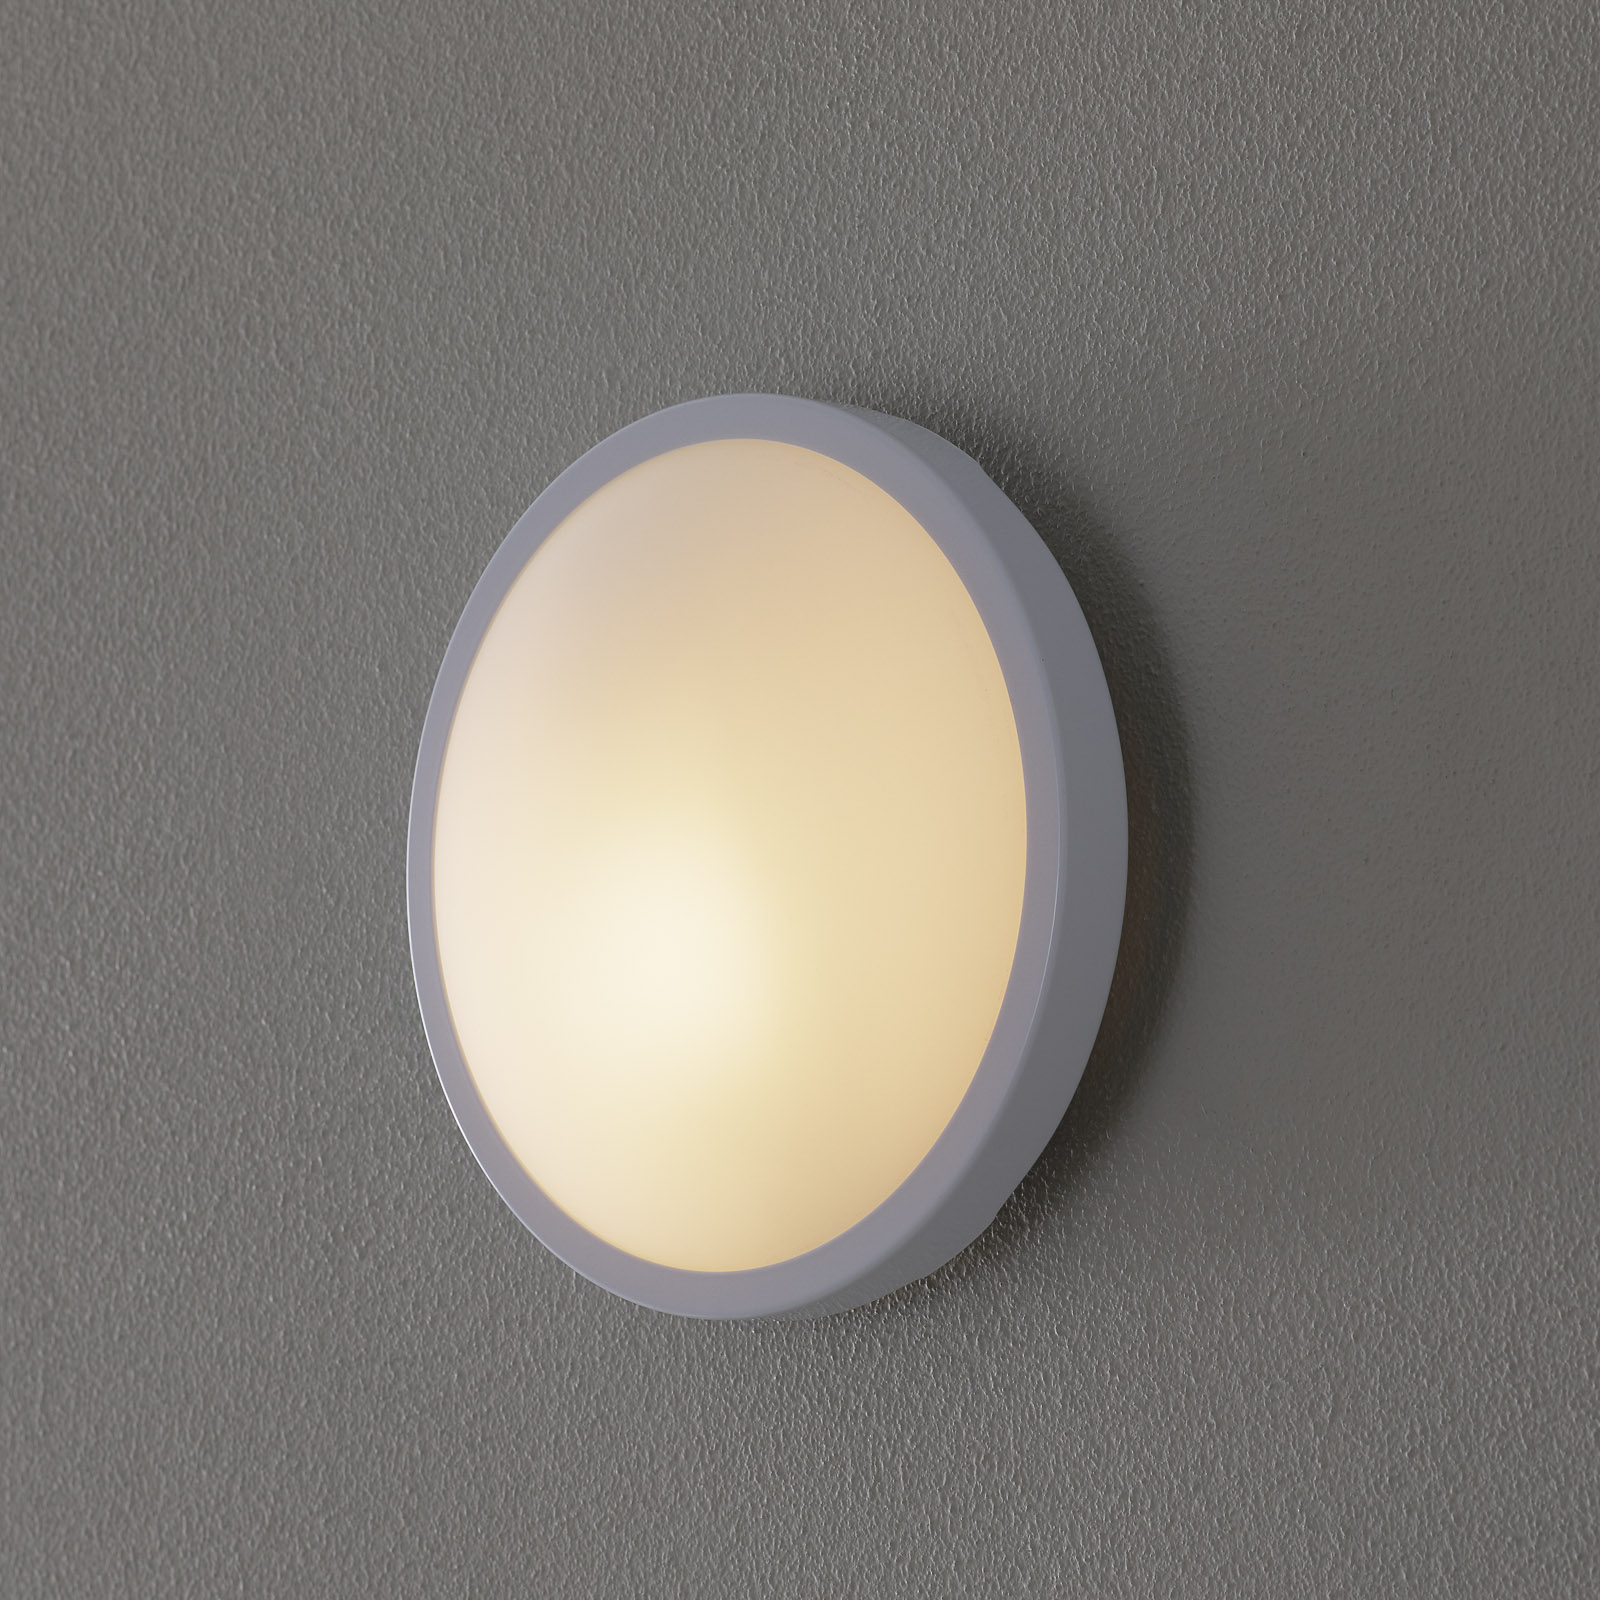 PLAZA glazen plafondlamp en wandlamp, 21,5cm ws